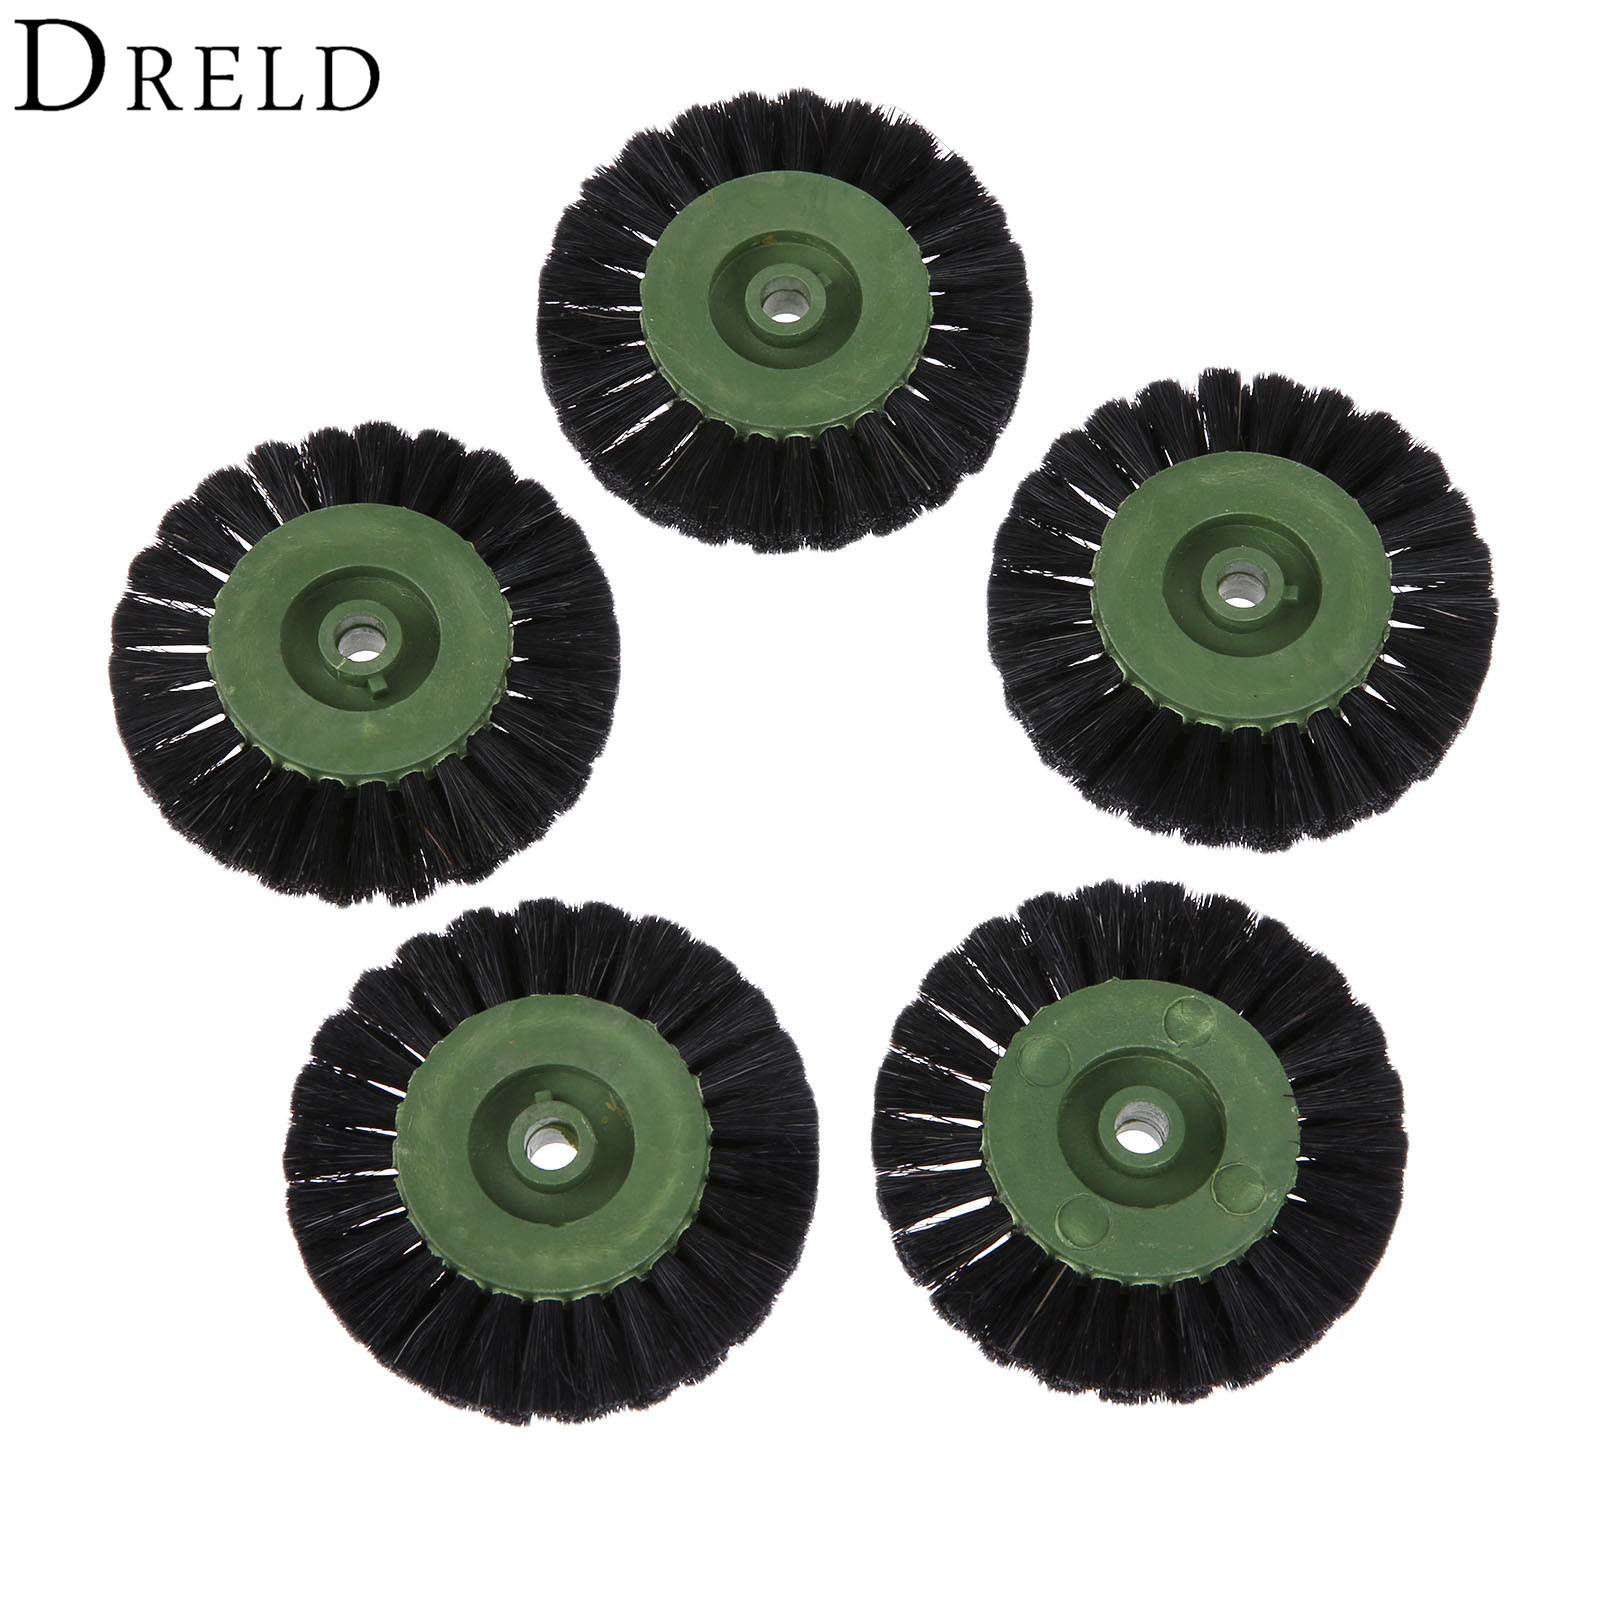 DRELD 5Pcs Dremel Accessories 60mm Grinding Brush Head Abrasive Wheel Black Buffing Polishing Wheels For Dremel Rotary Tool